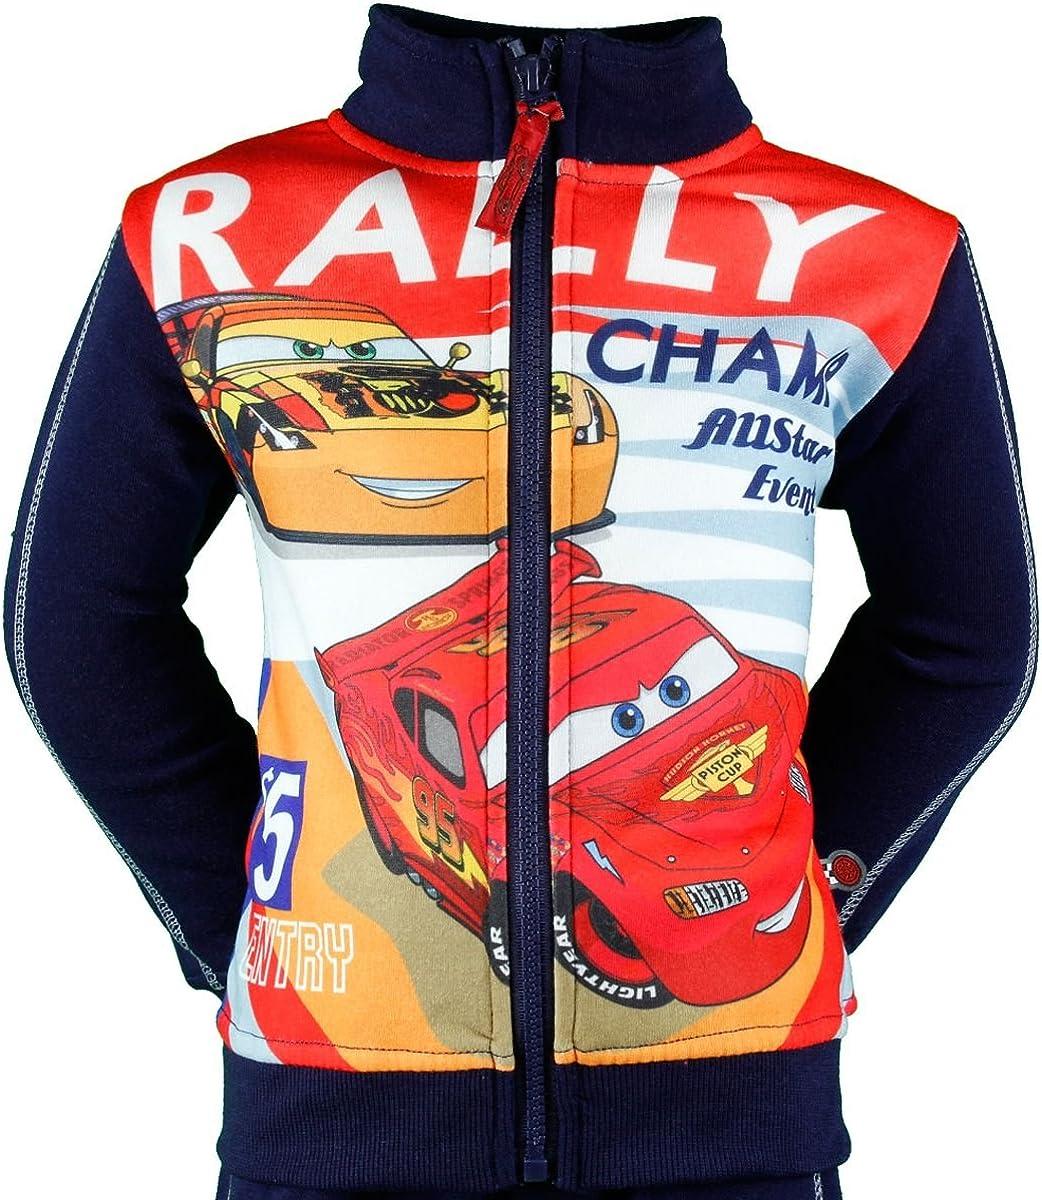 Cars chándal manga larga de Rally Boy: Amazon.es: Ropa y accesorios